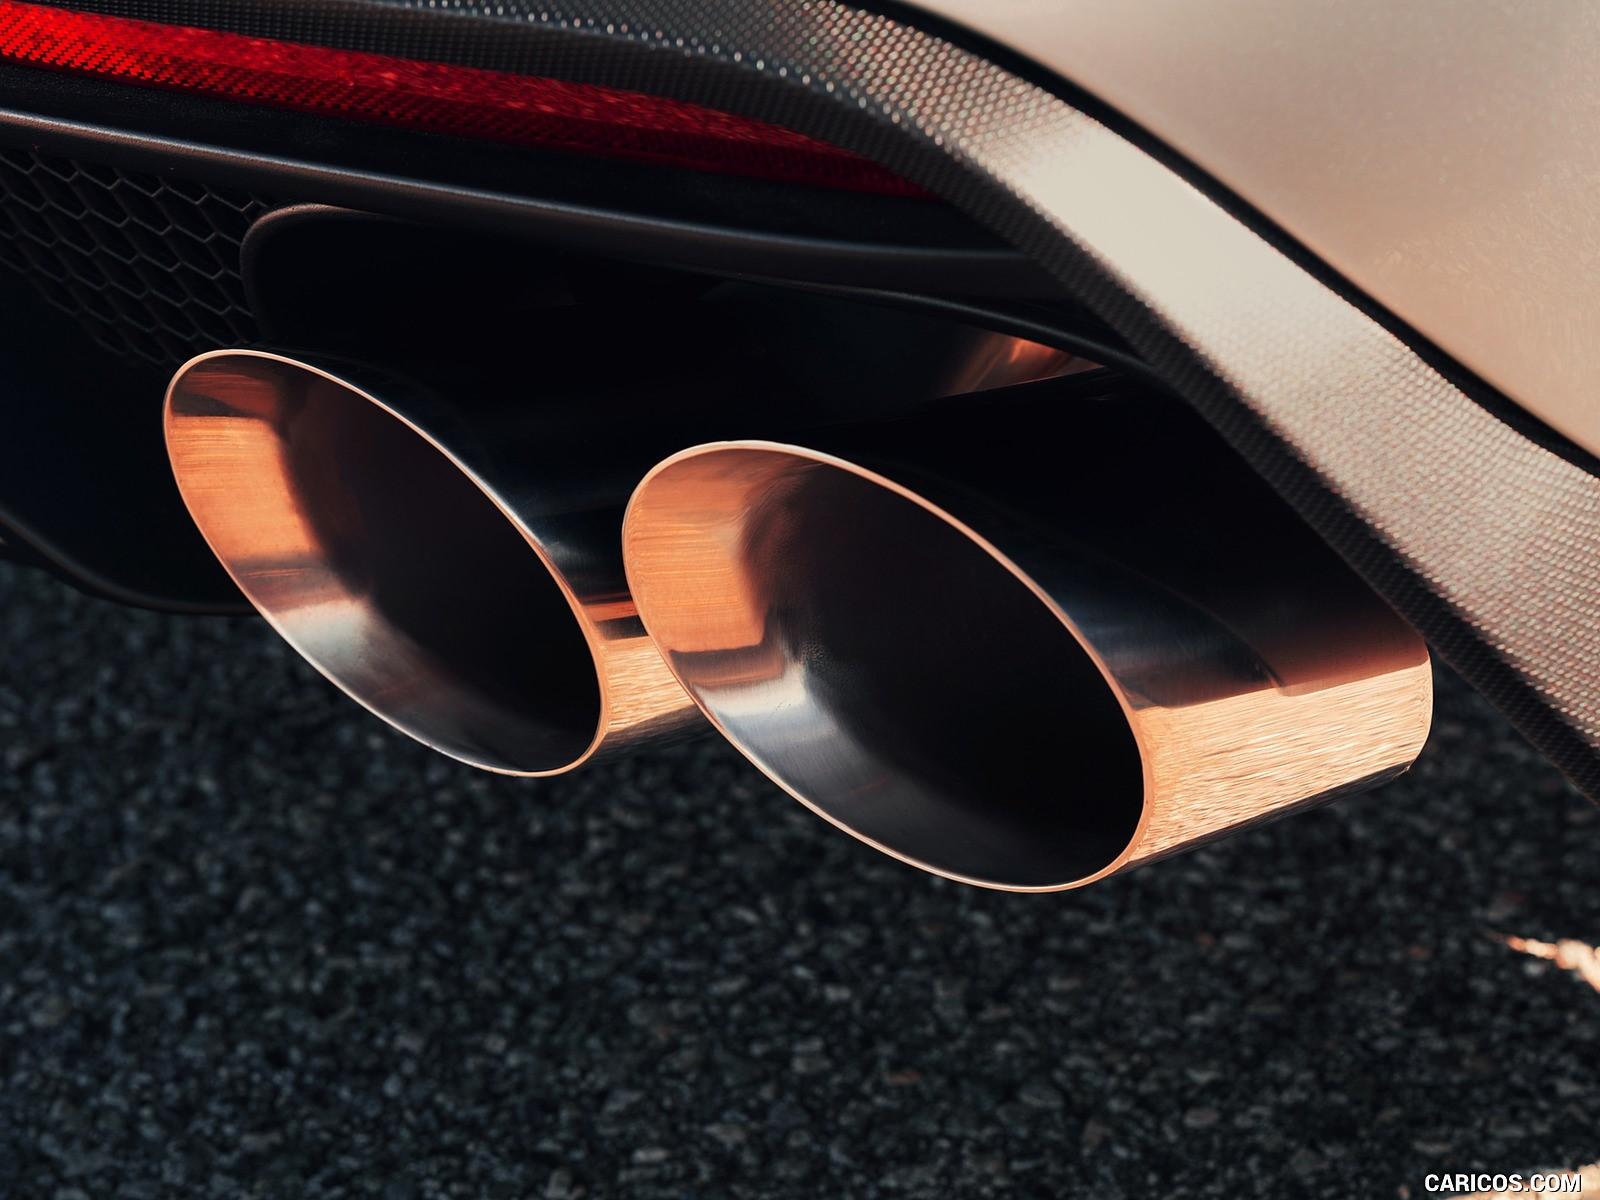 Ford Mustang Shelby 12k duvarkağıtları